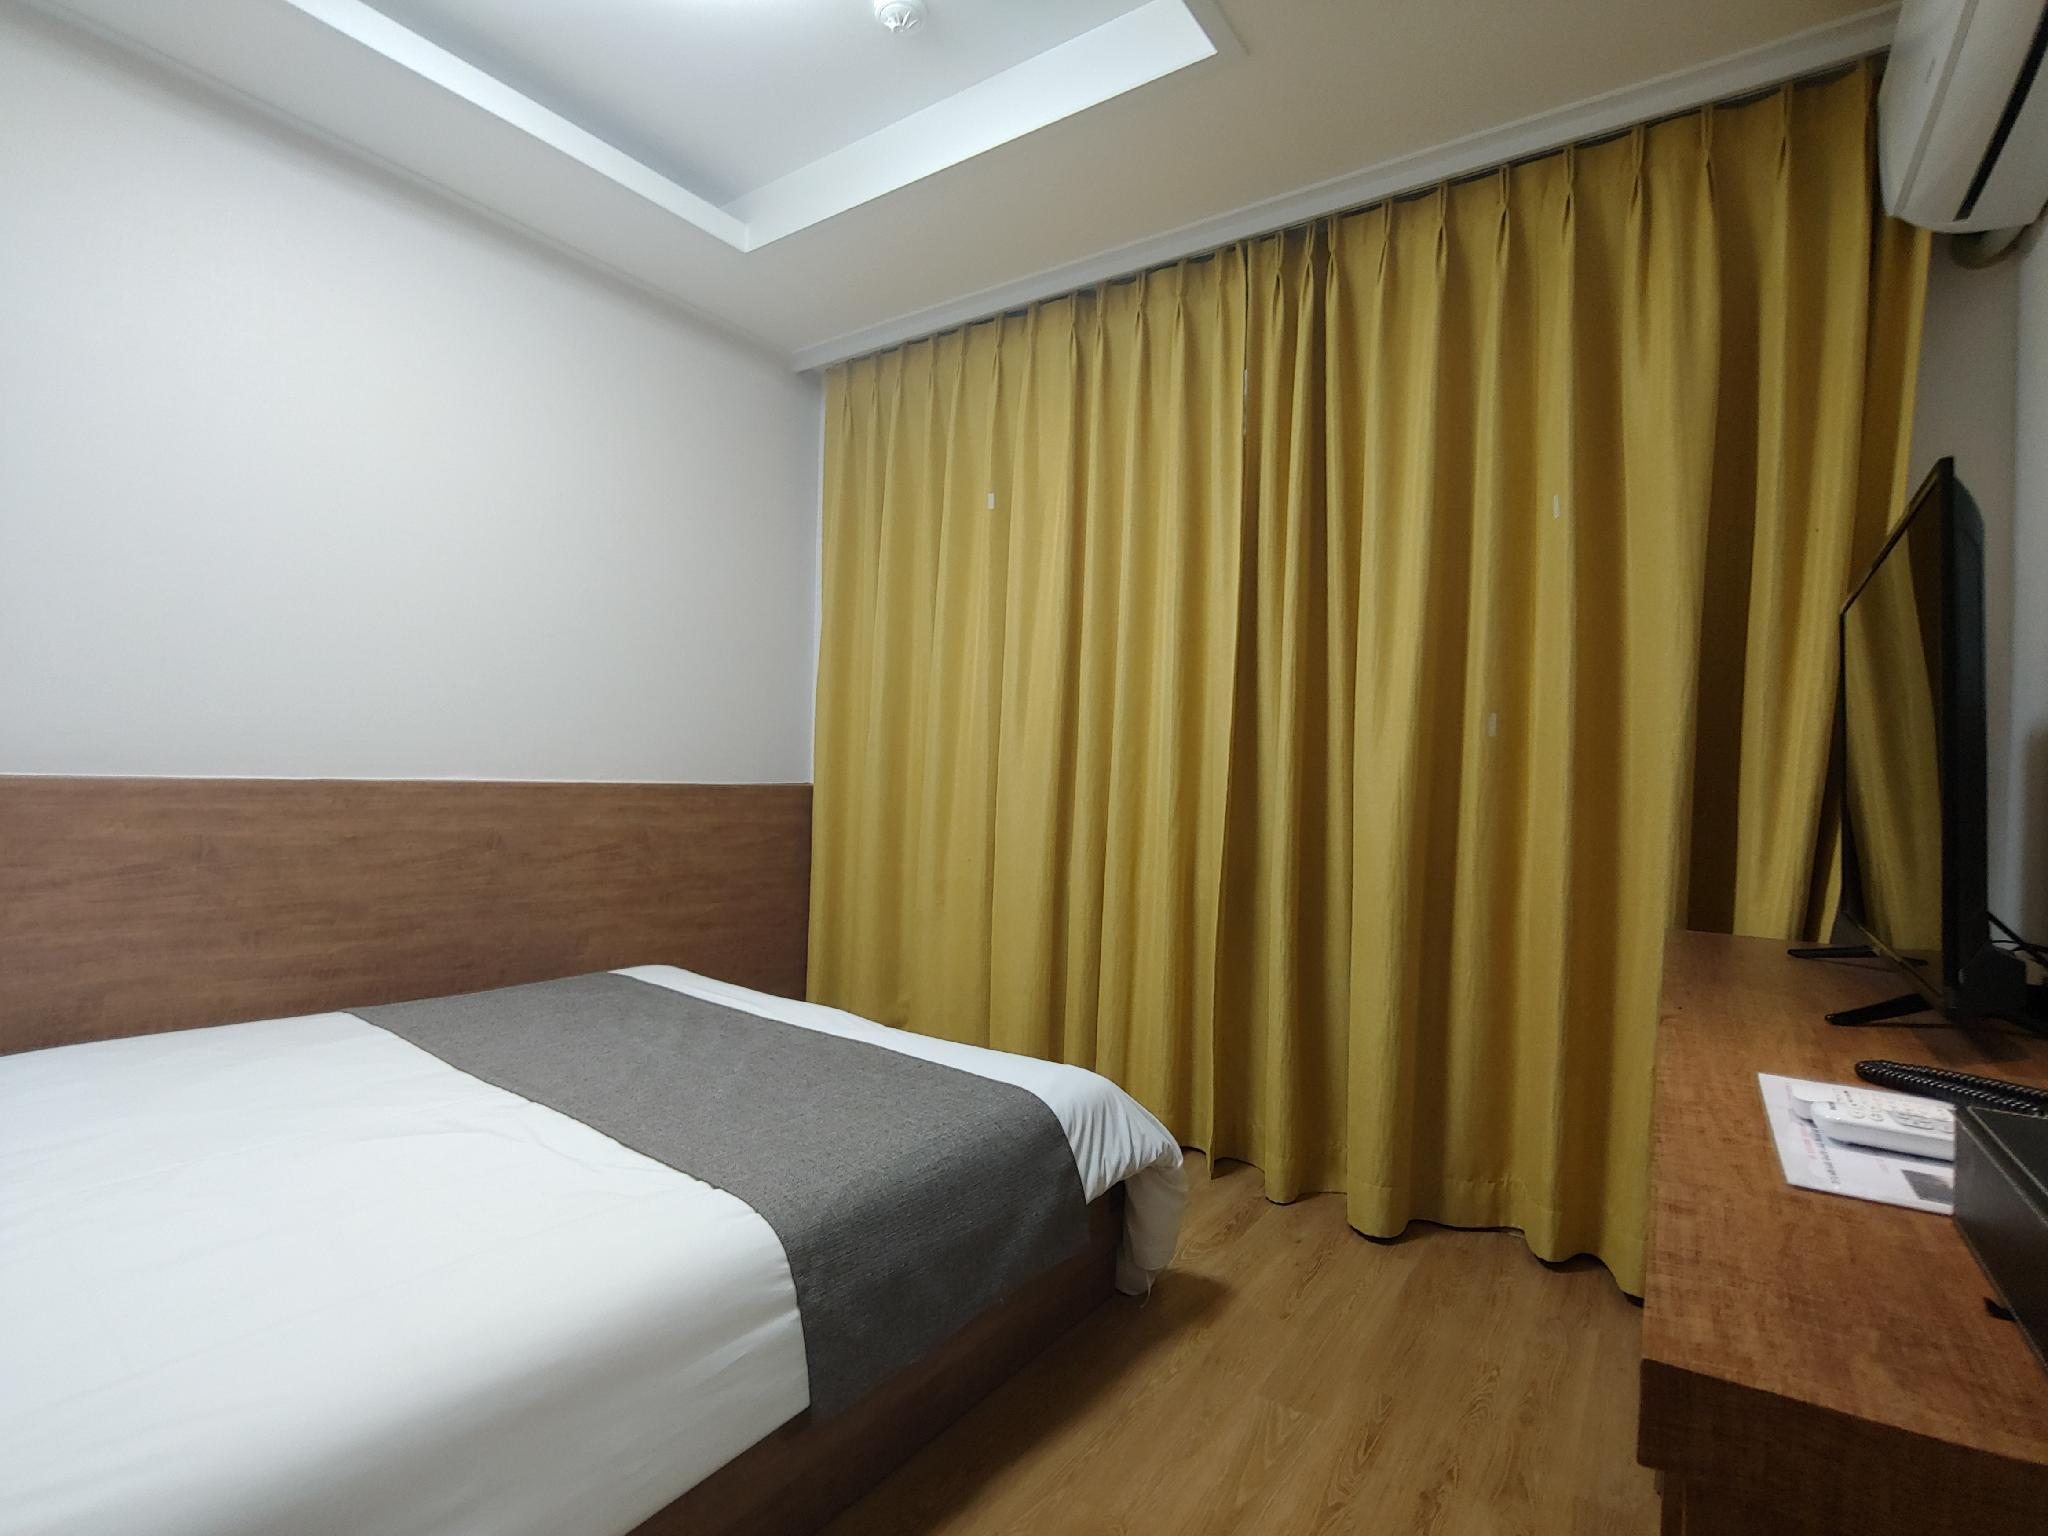 Gallery Hotel BnB 2